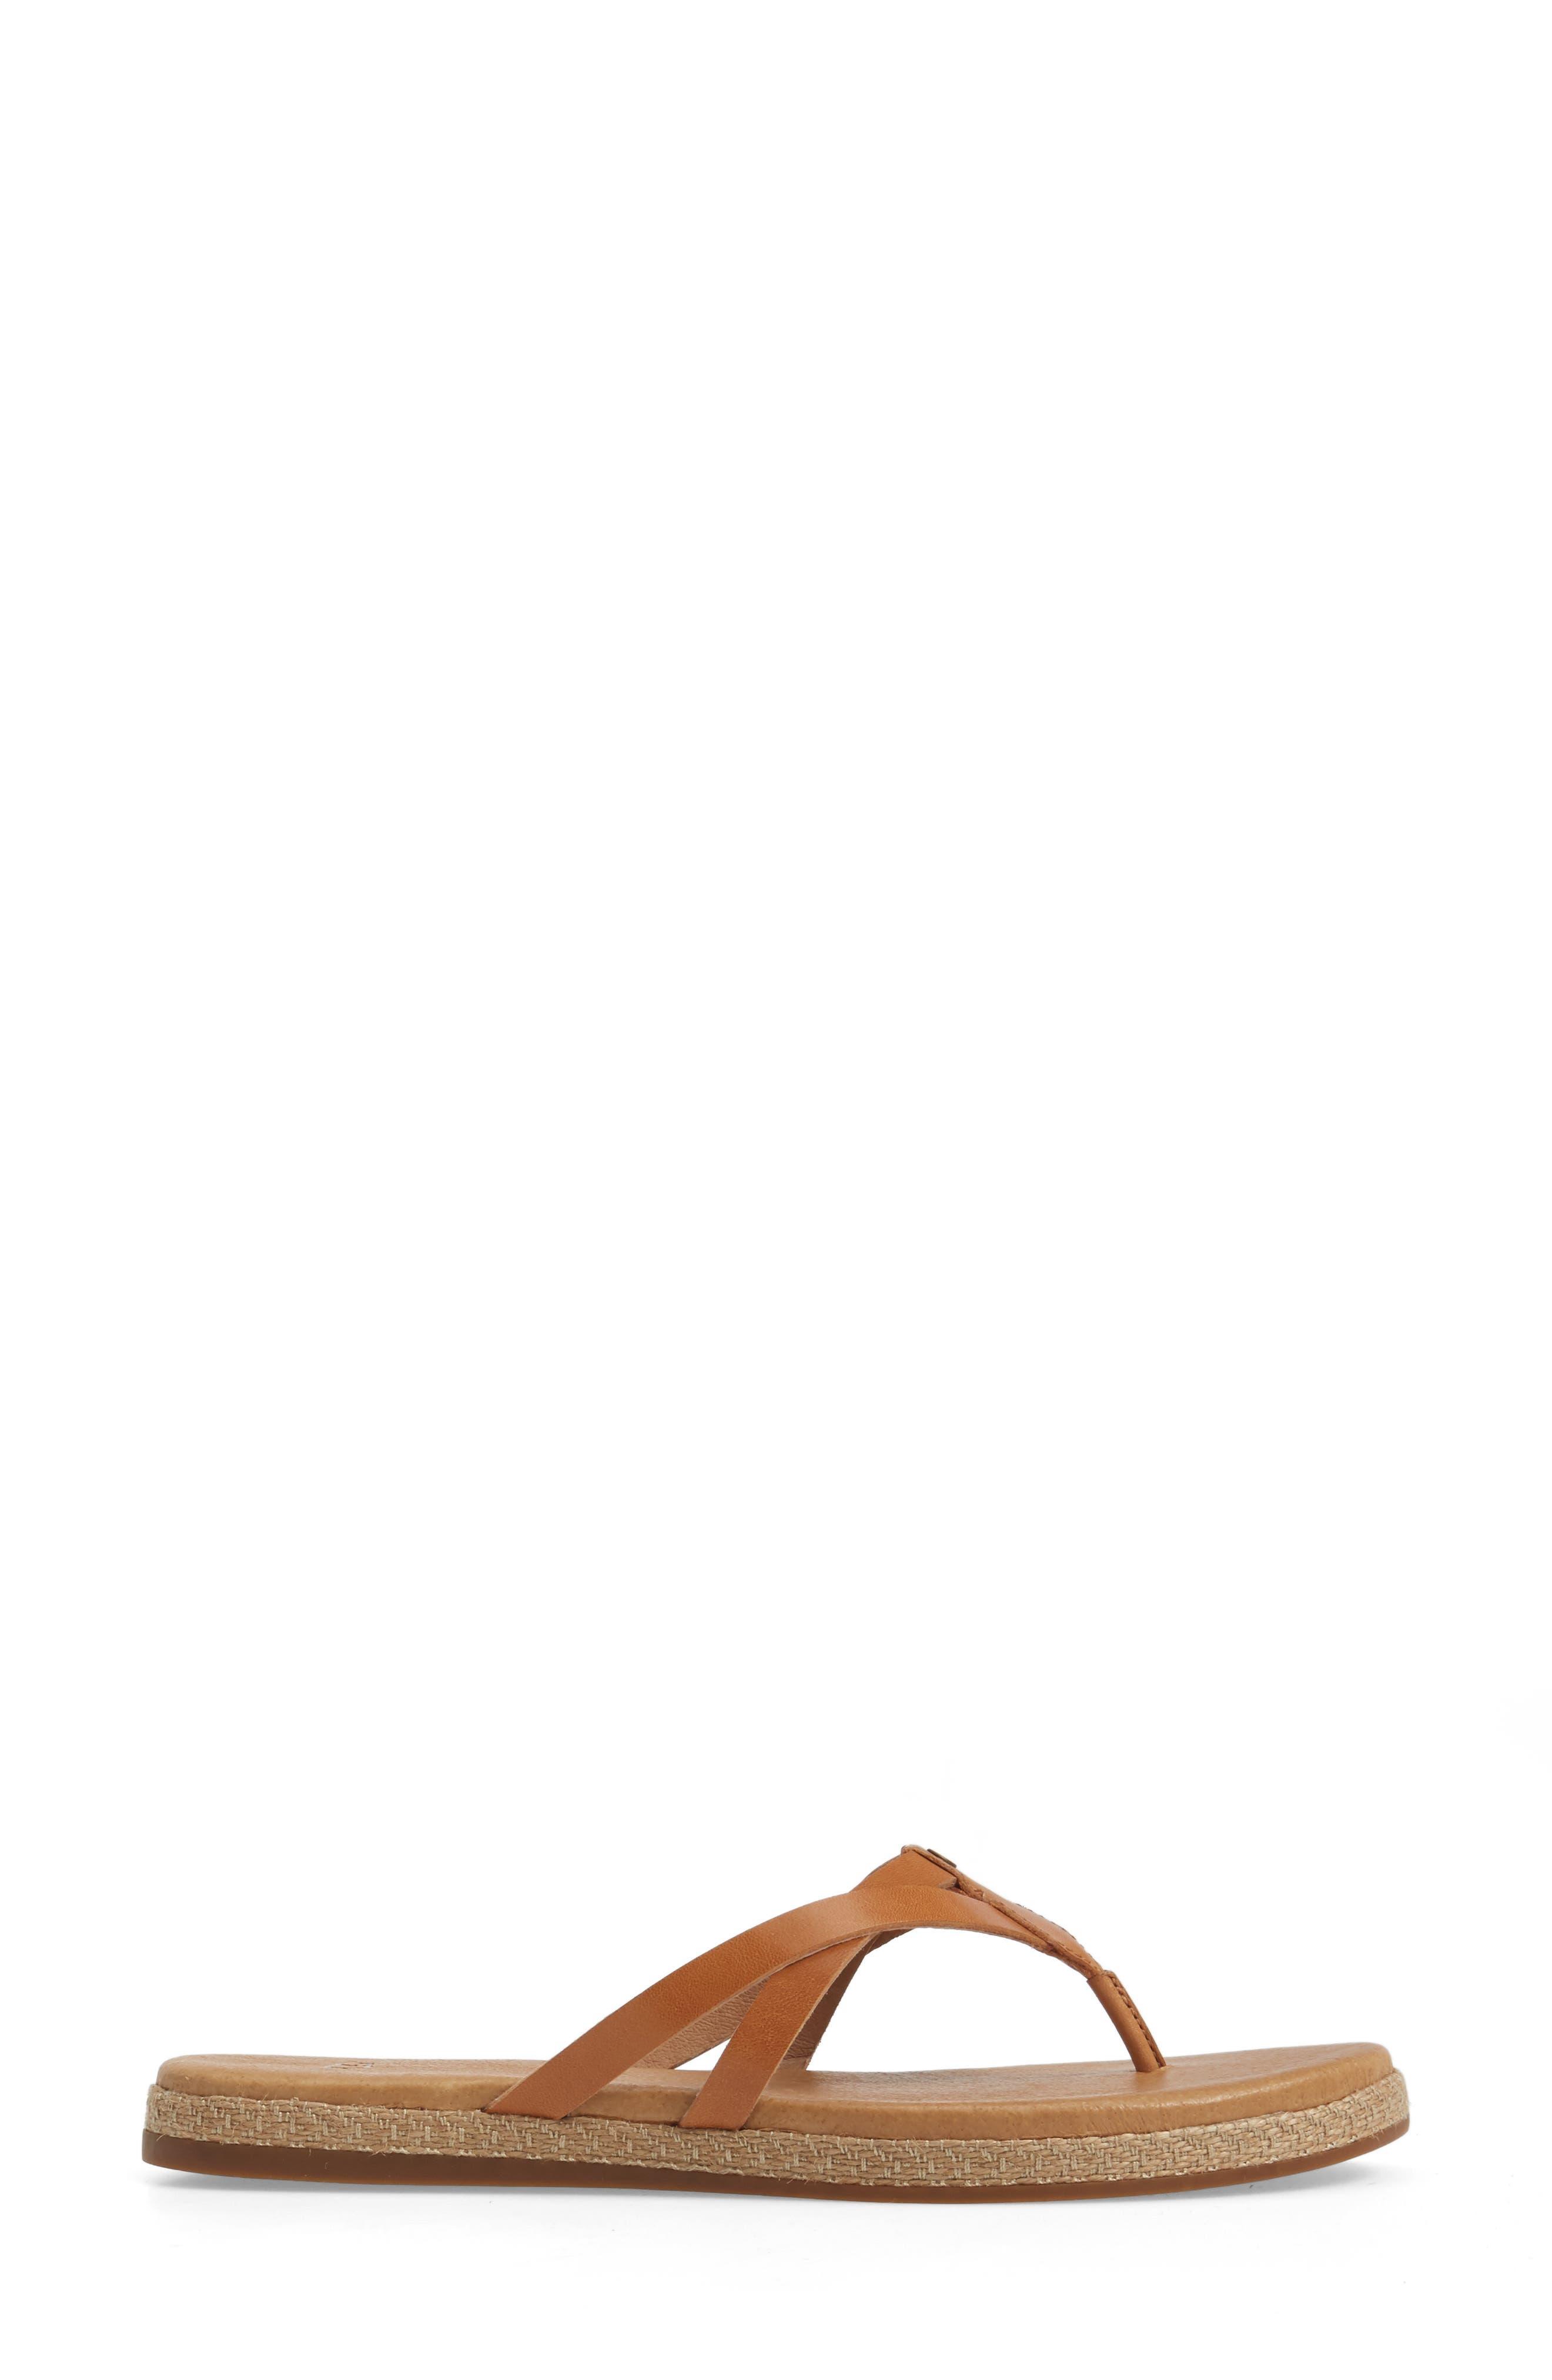 Annice Flip Flop,                             Alternate thumbnail 3, color,                             Cafe Leather